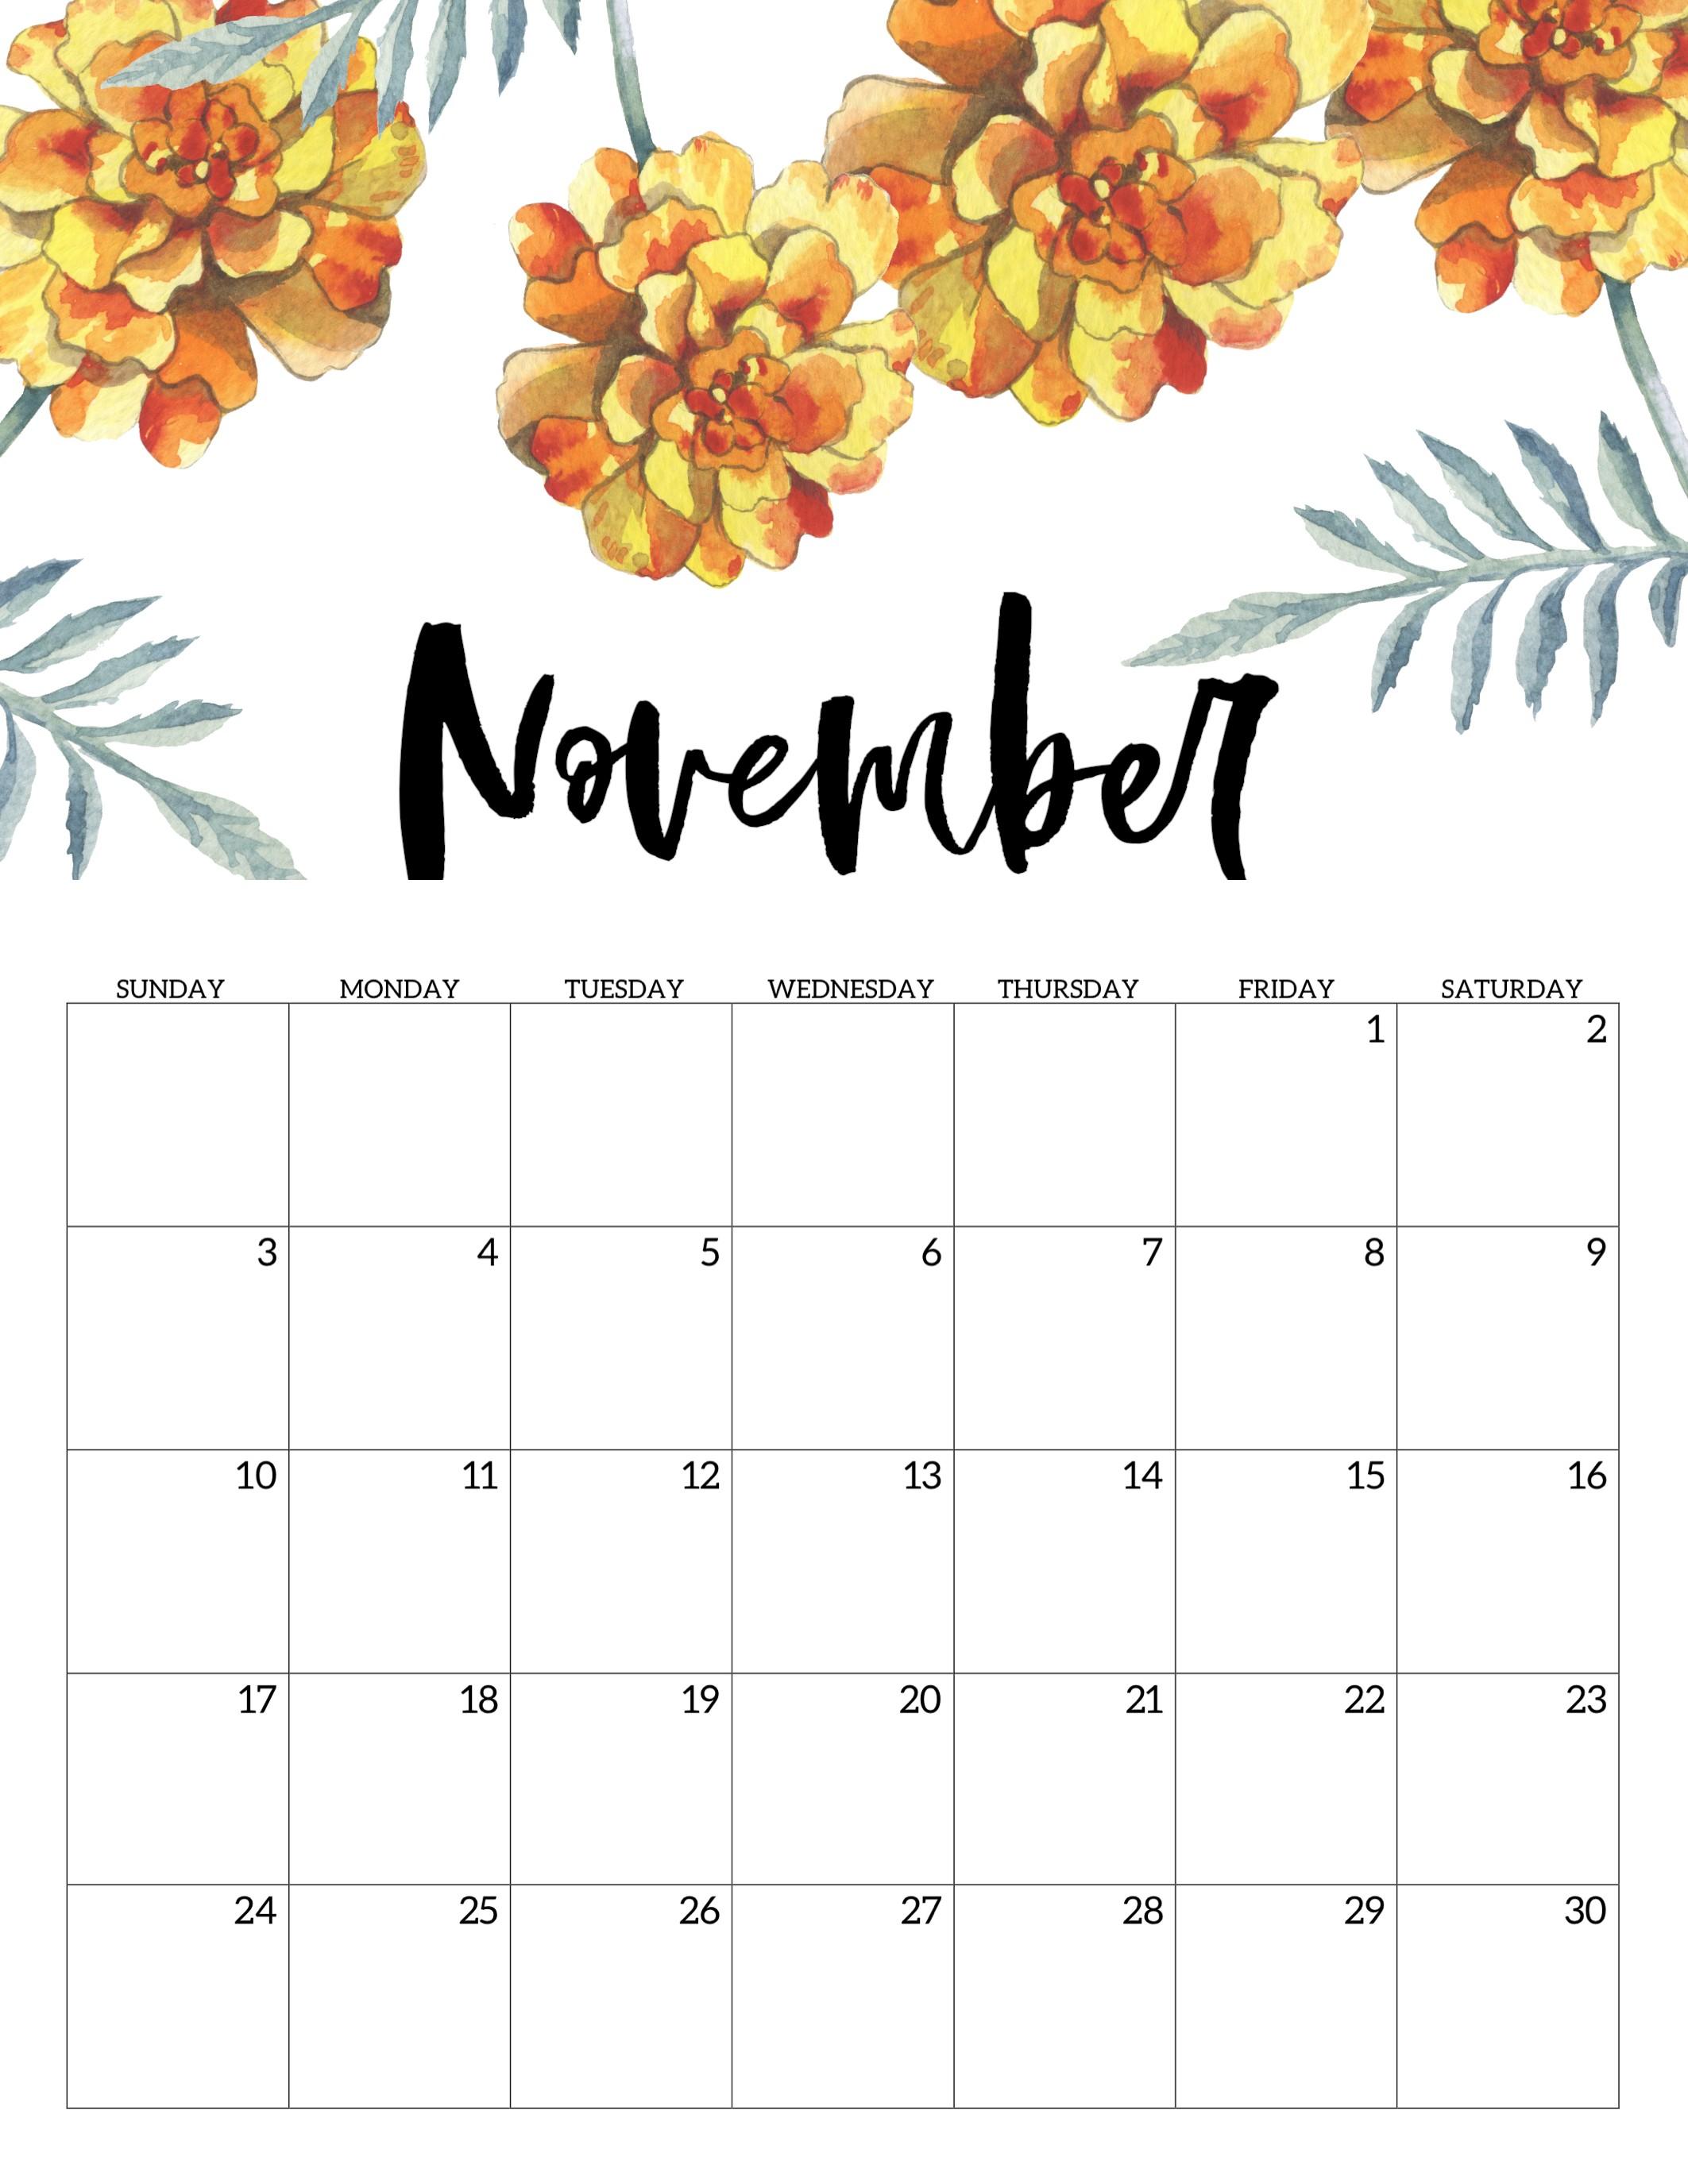 November 2019 Printable Calendar Free Printable Calendar 2019 Floral Paper Trail Design